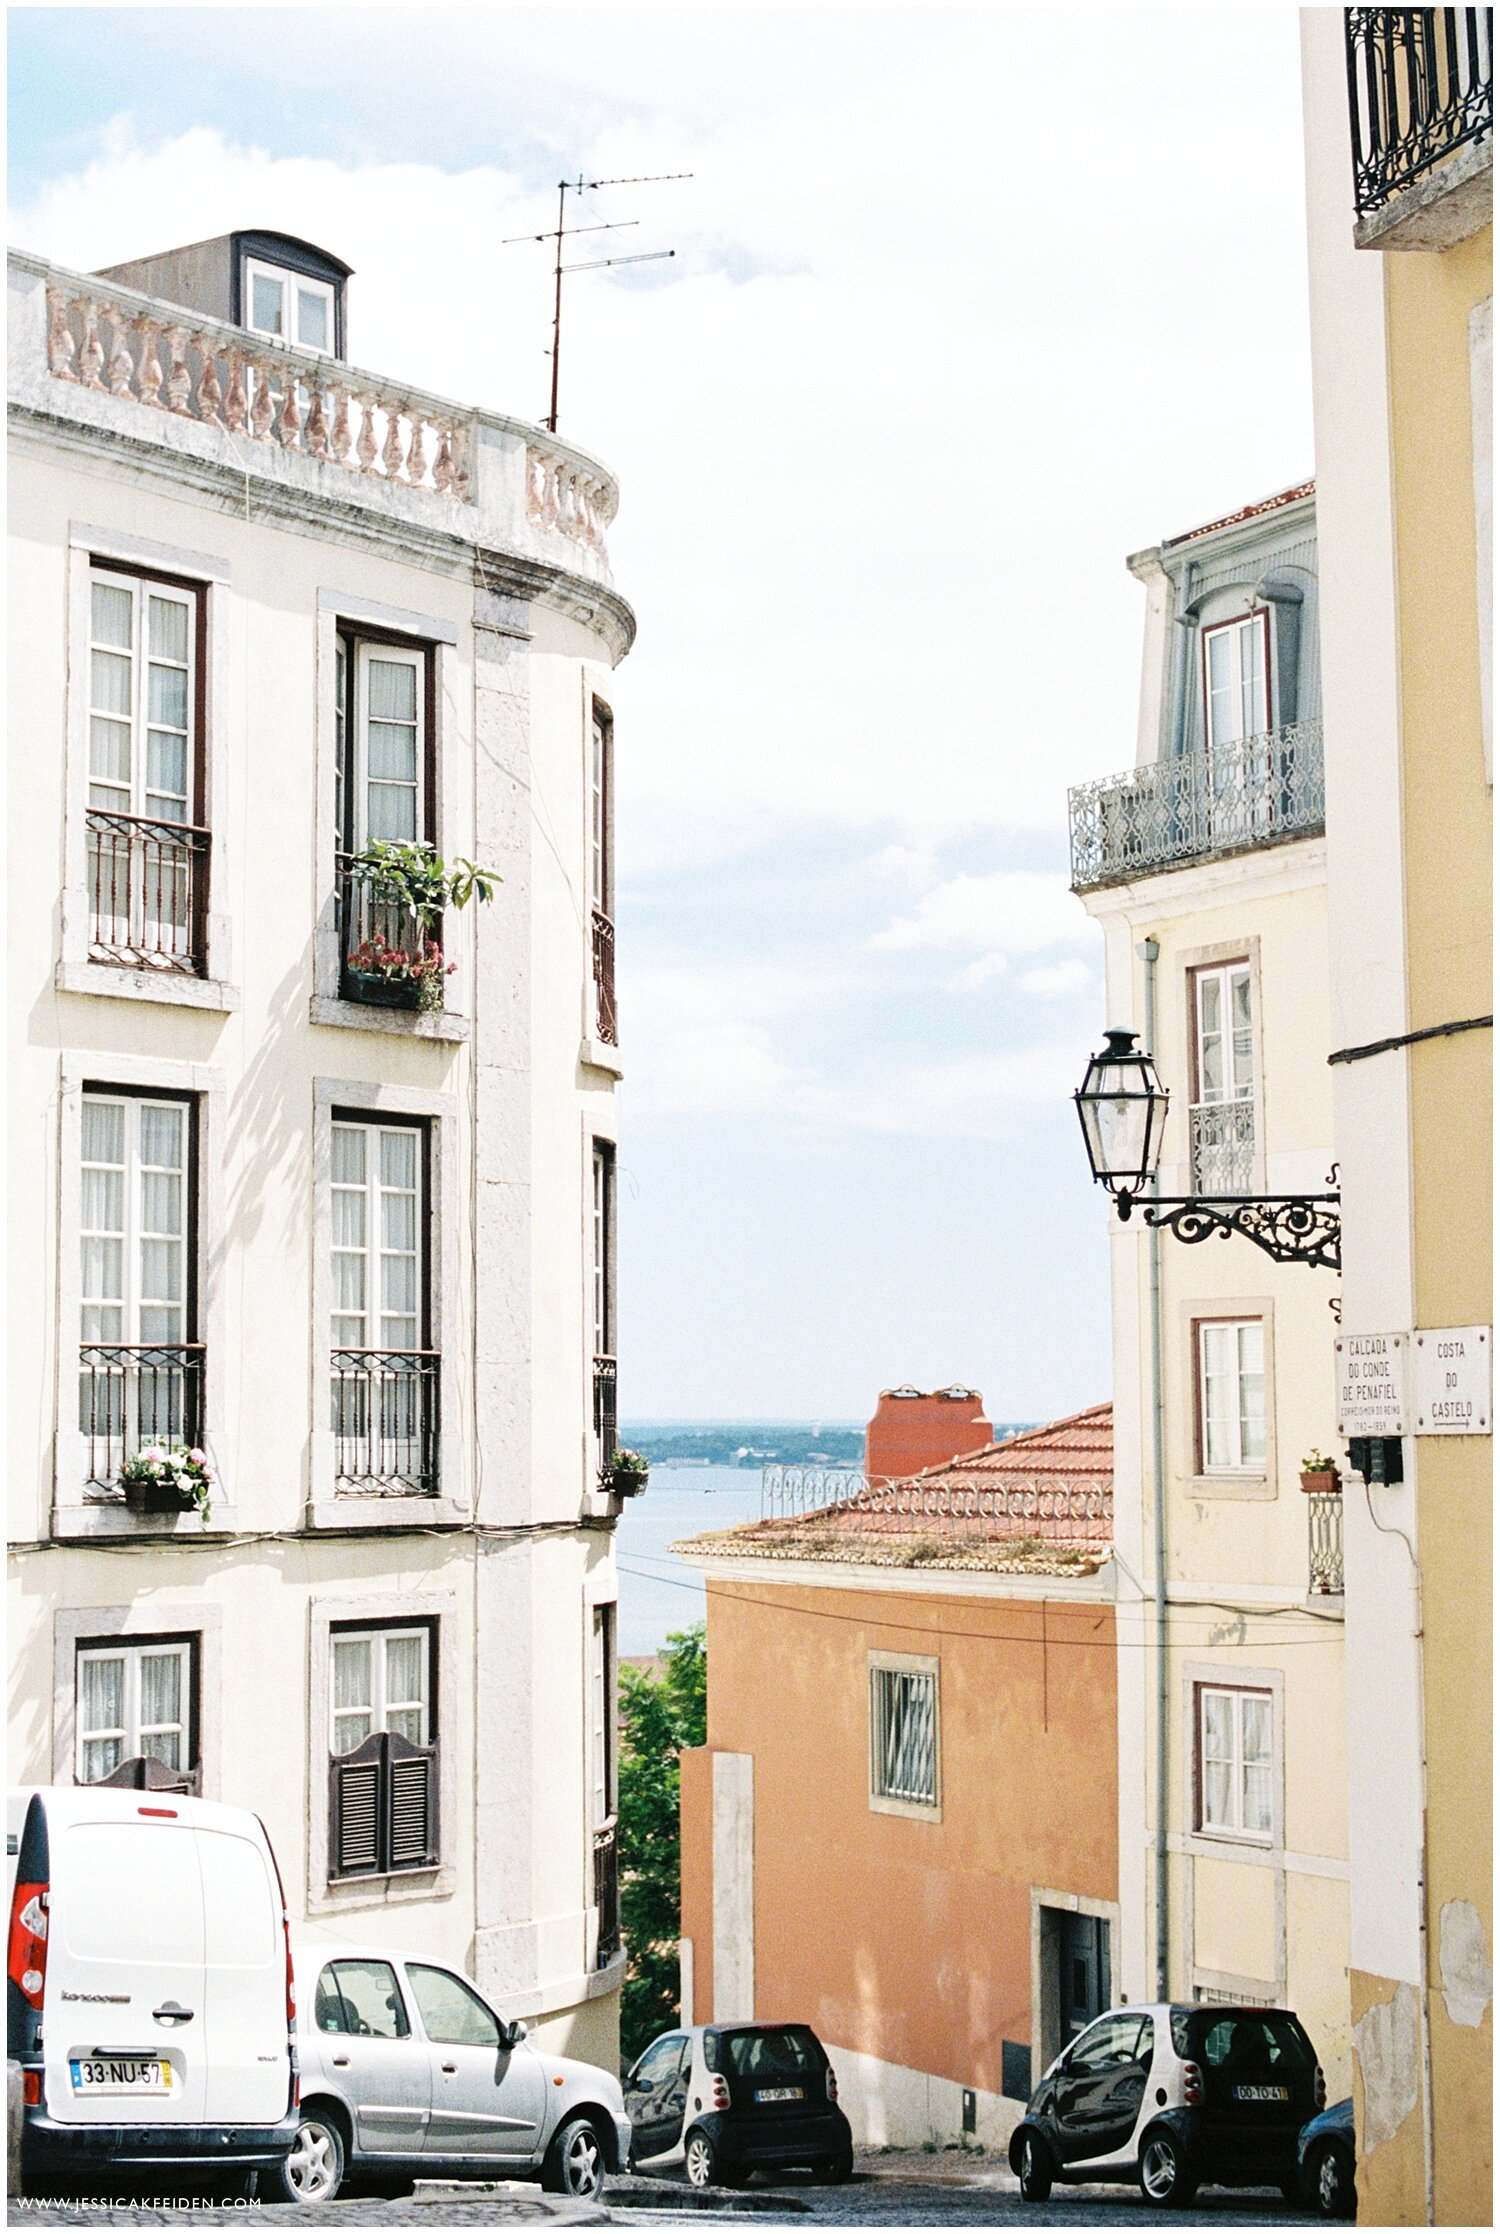 Jessica K Feiden Photography_Portugal Film Photographer_Portugal Travel Photographs_0014.jpg